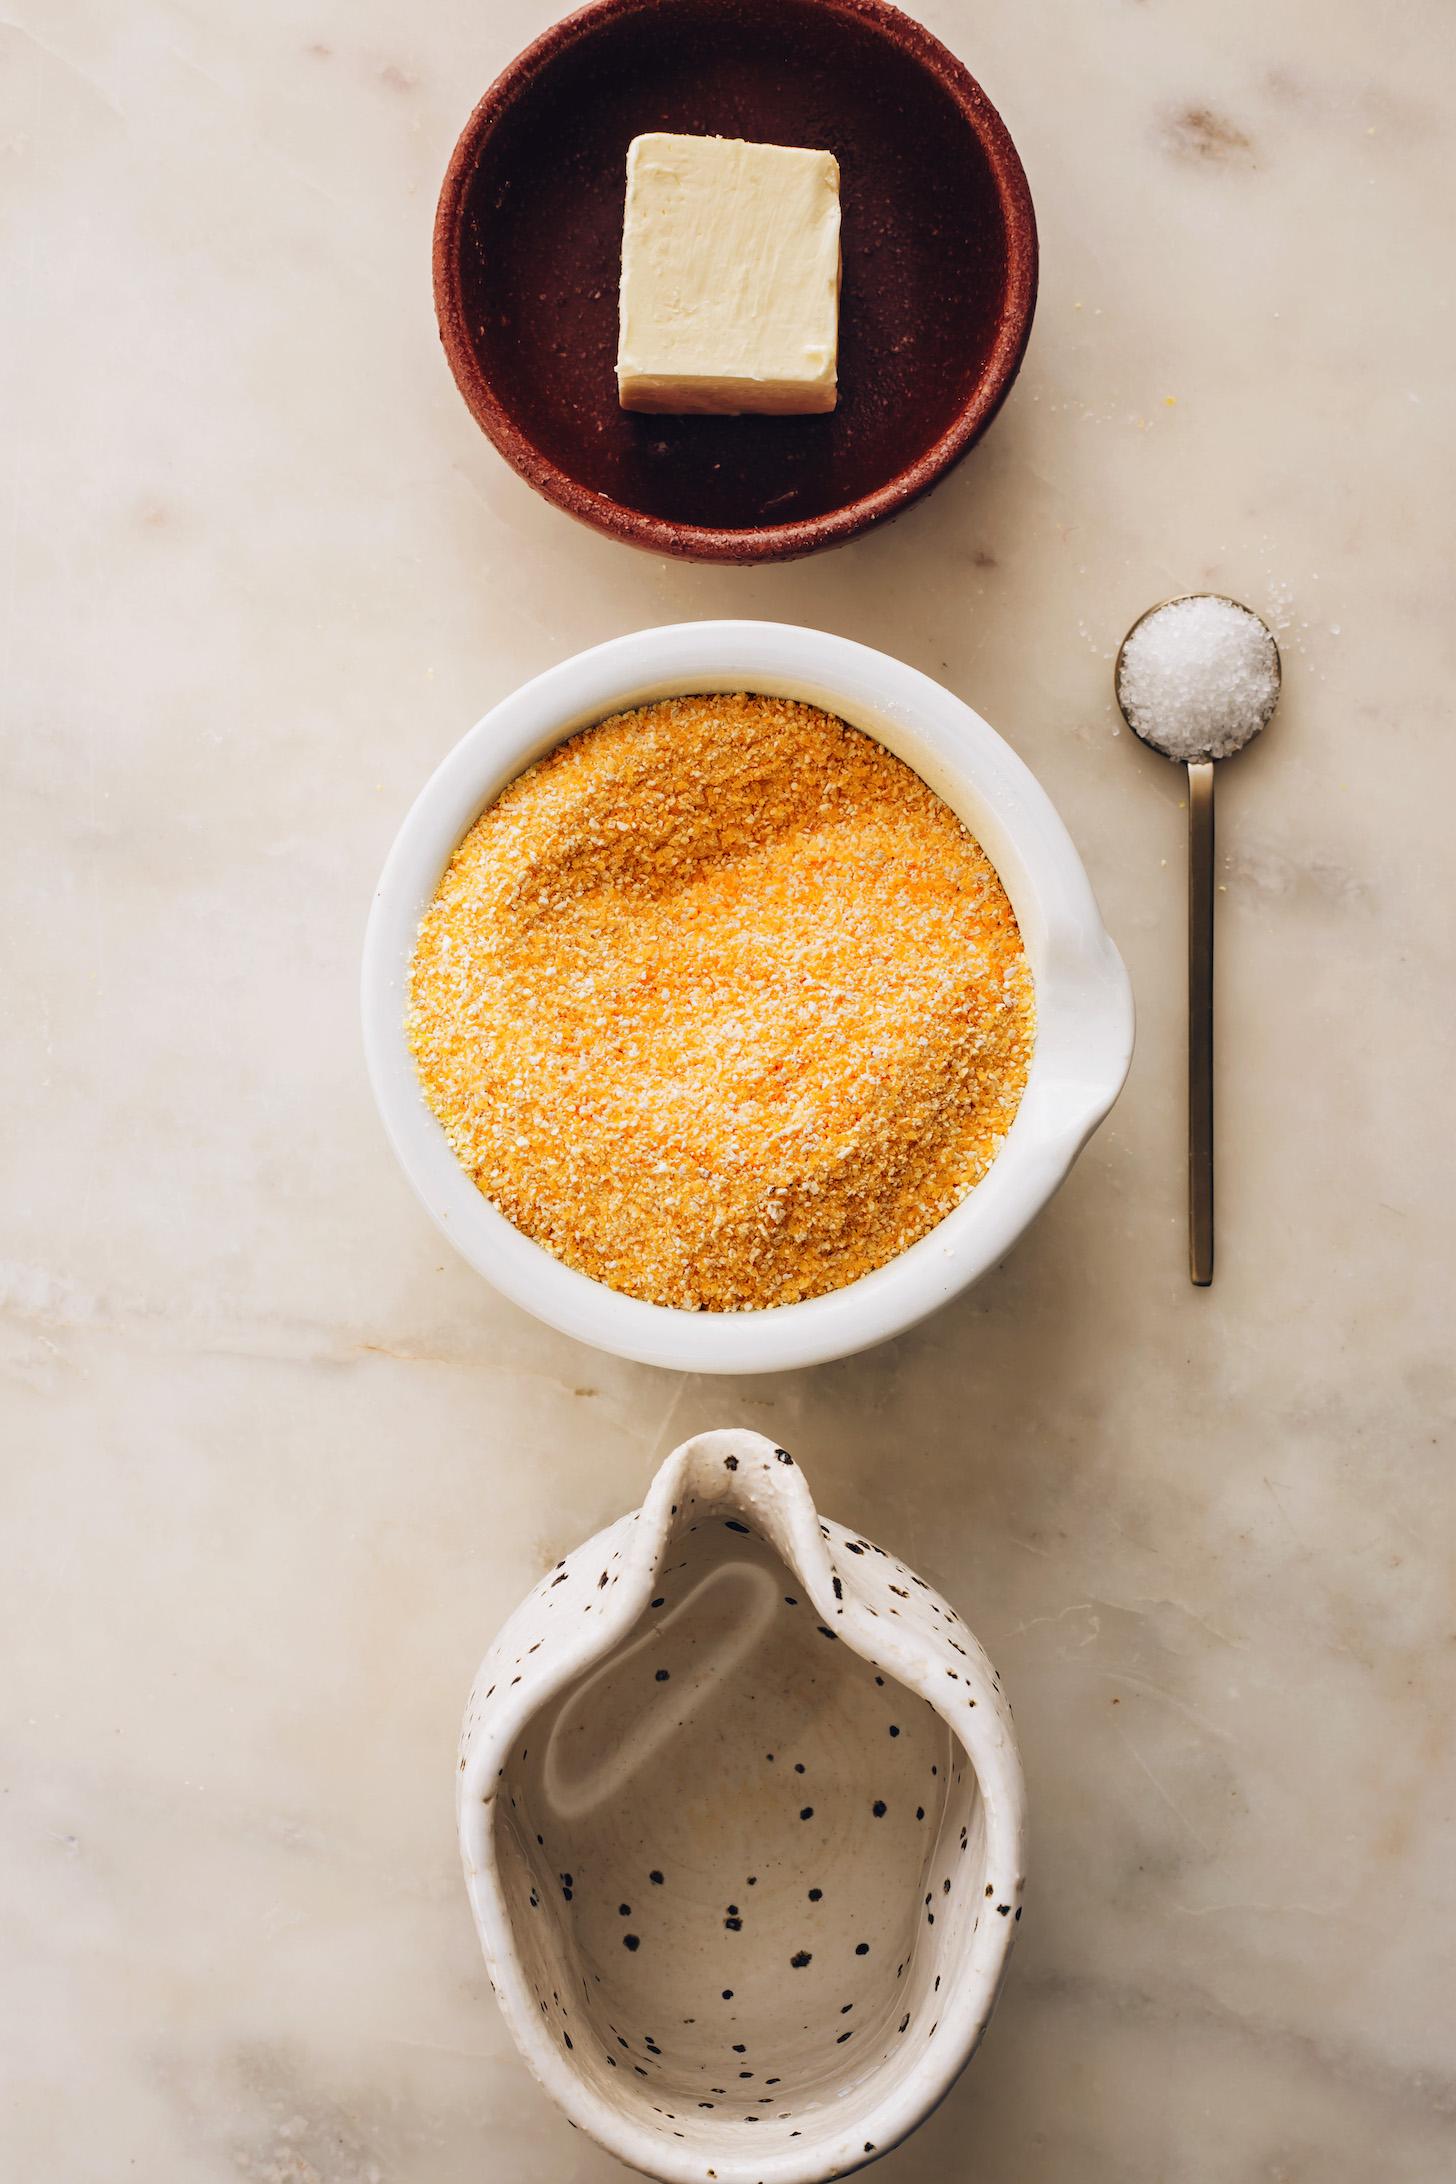 Vegan butter, polenta, water, and sea salt